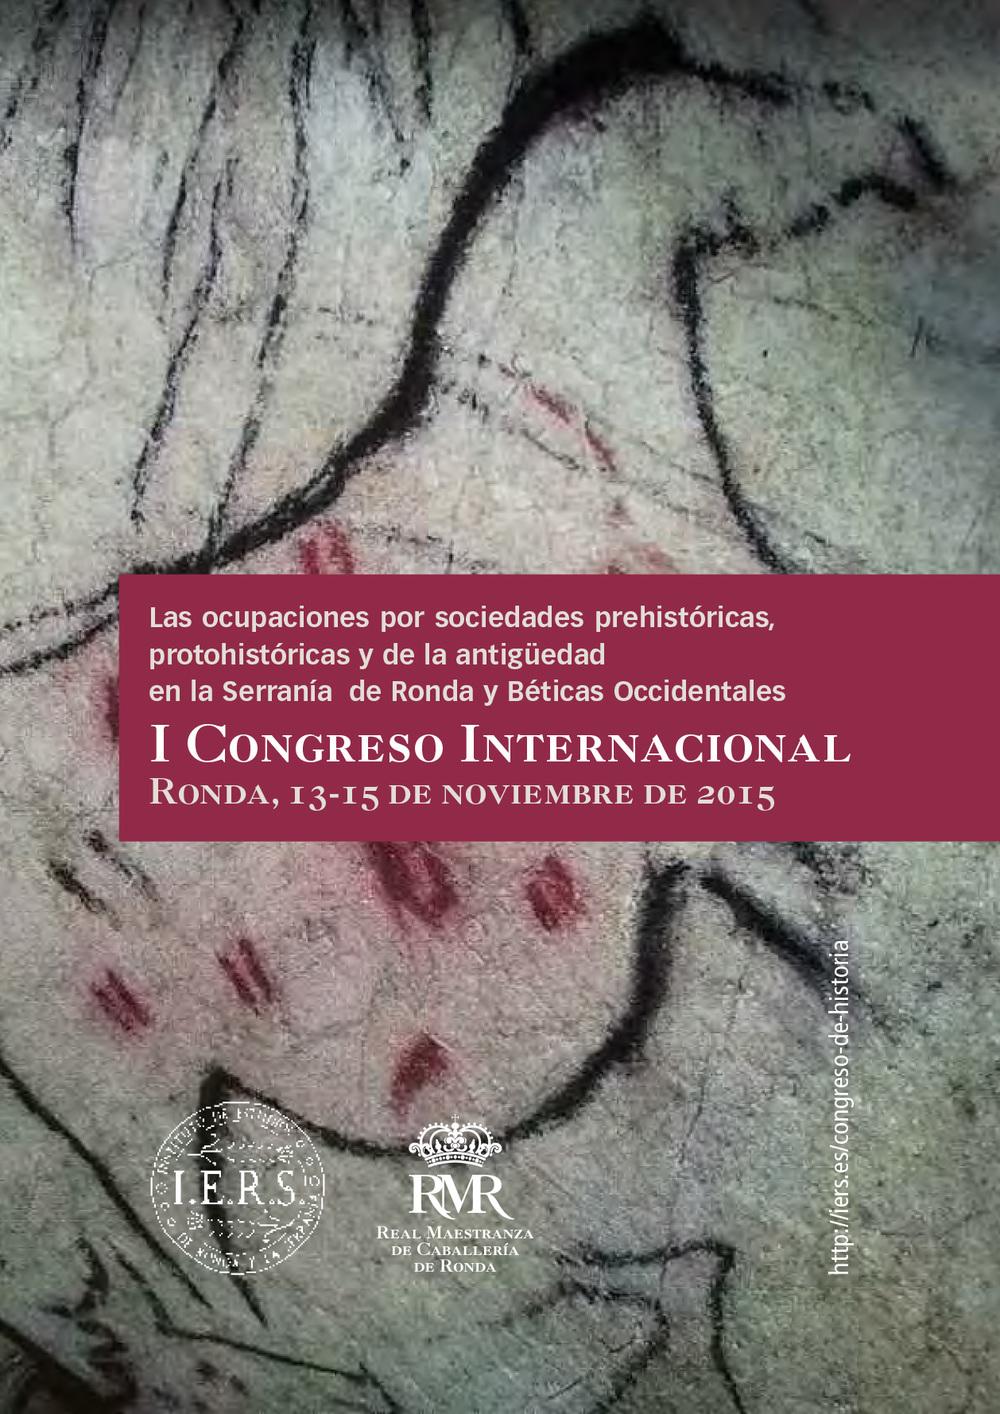 Congreso  Internacional Ronda-Primera circular.jpg